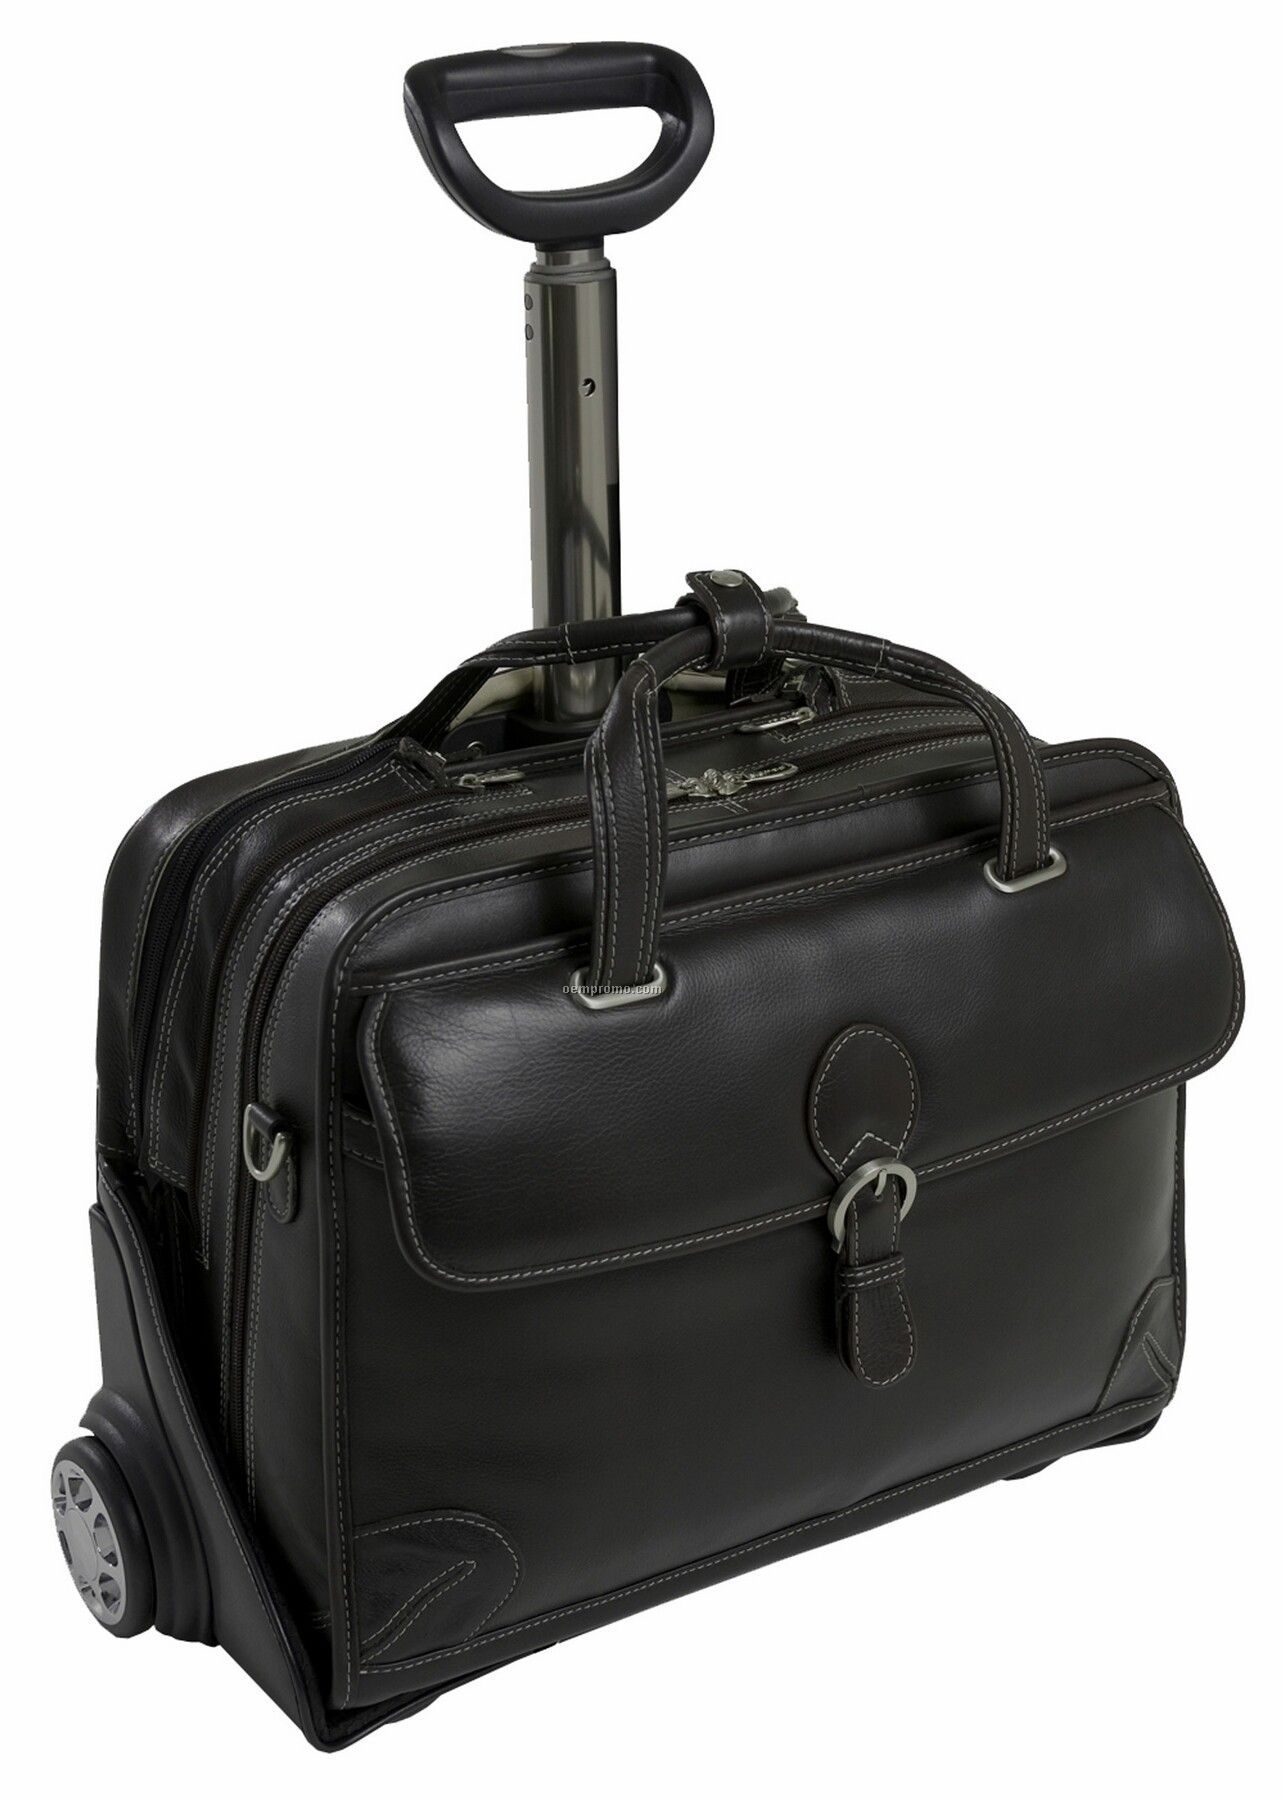 Carugetto Leather Detachable Wheeled Laptop Case - Black